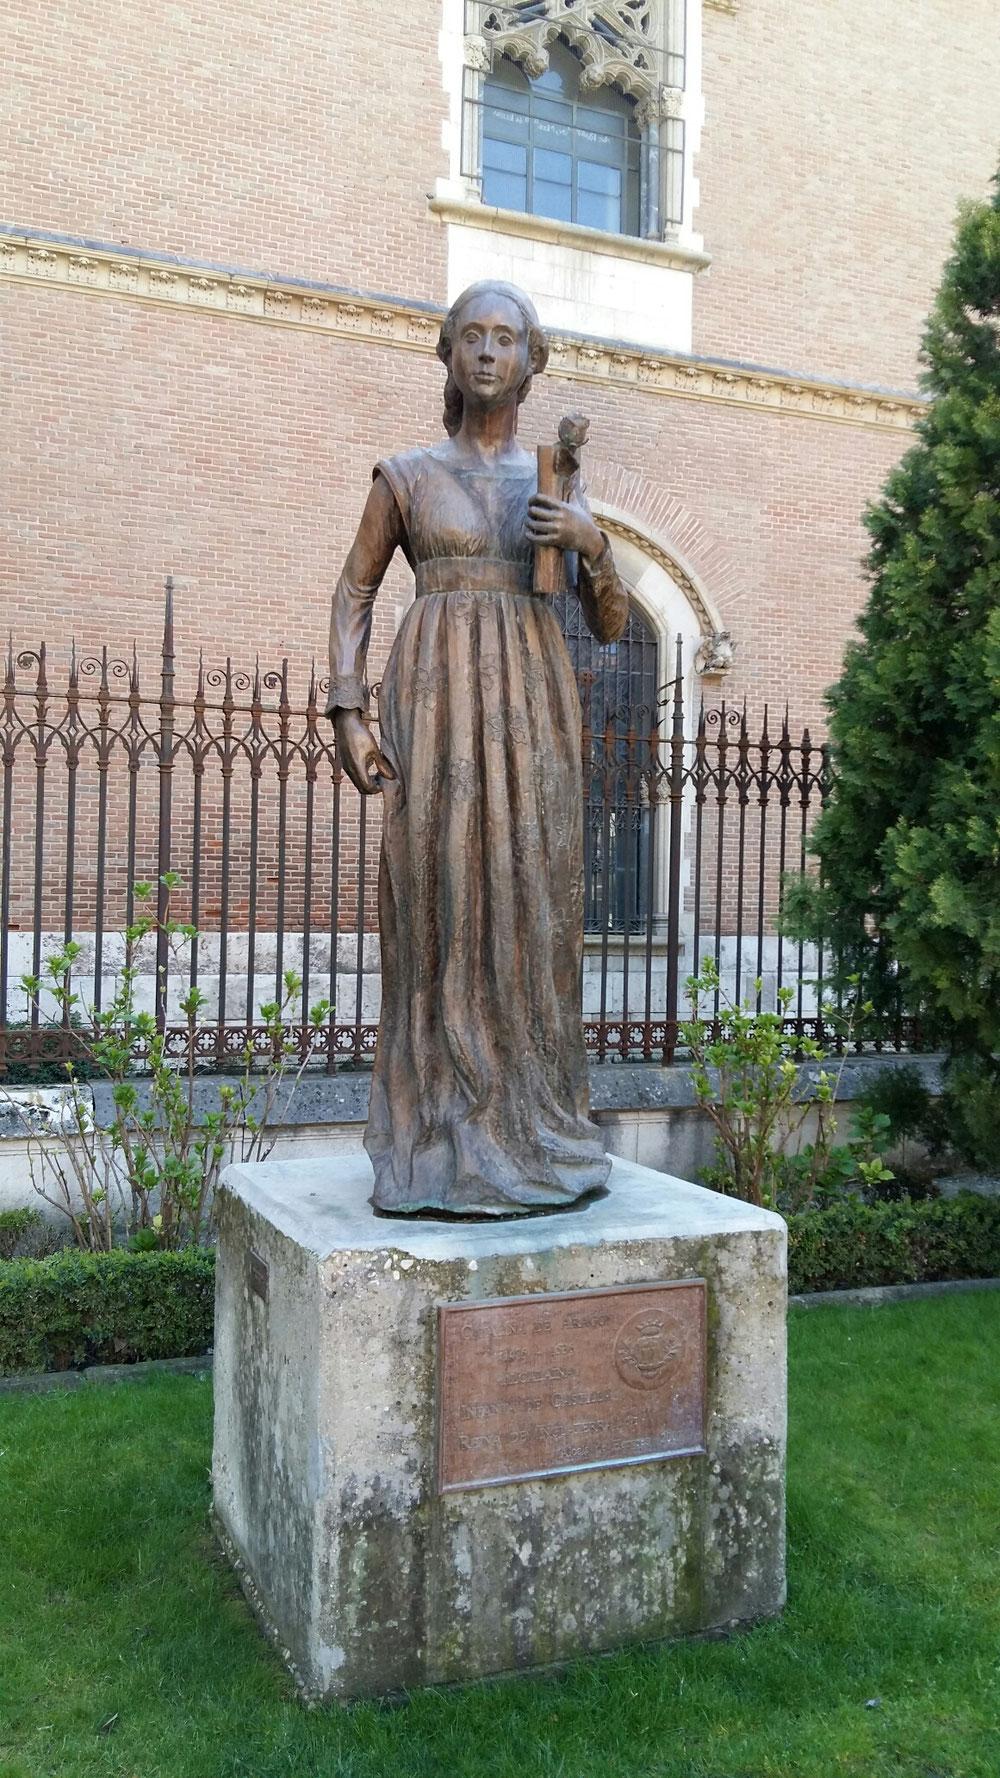 Catalina de Aragon - Infanta de Castilla - Alcalá de Henares